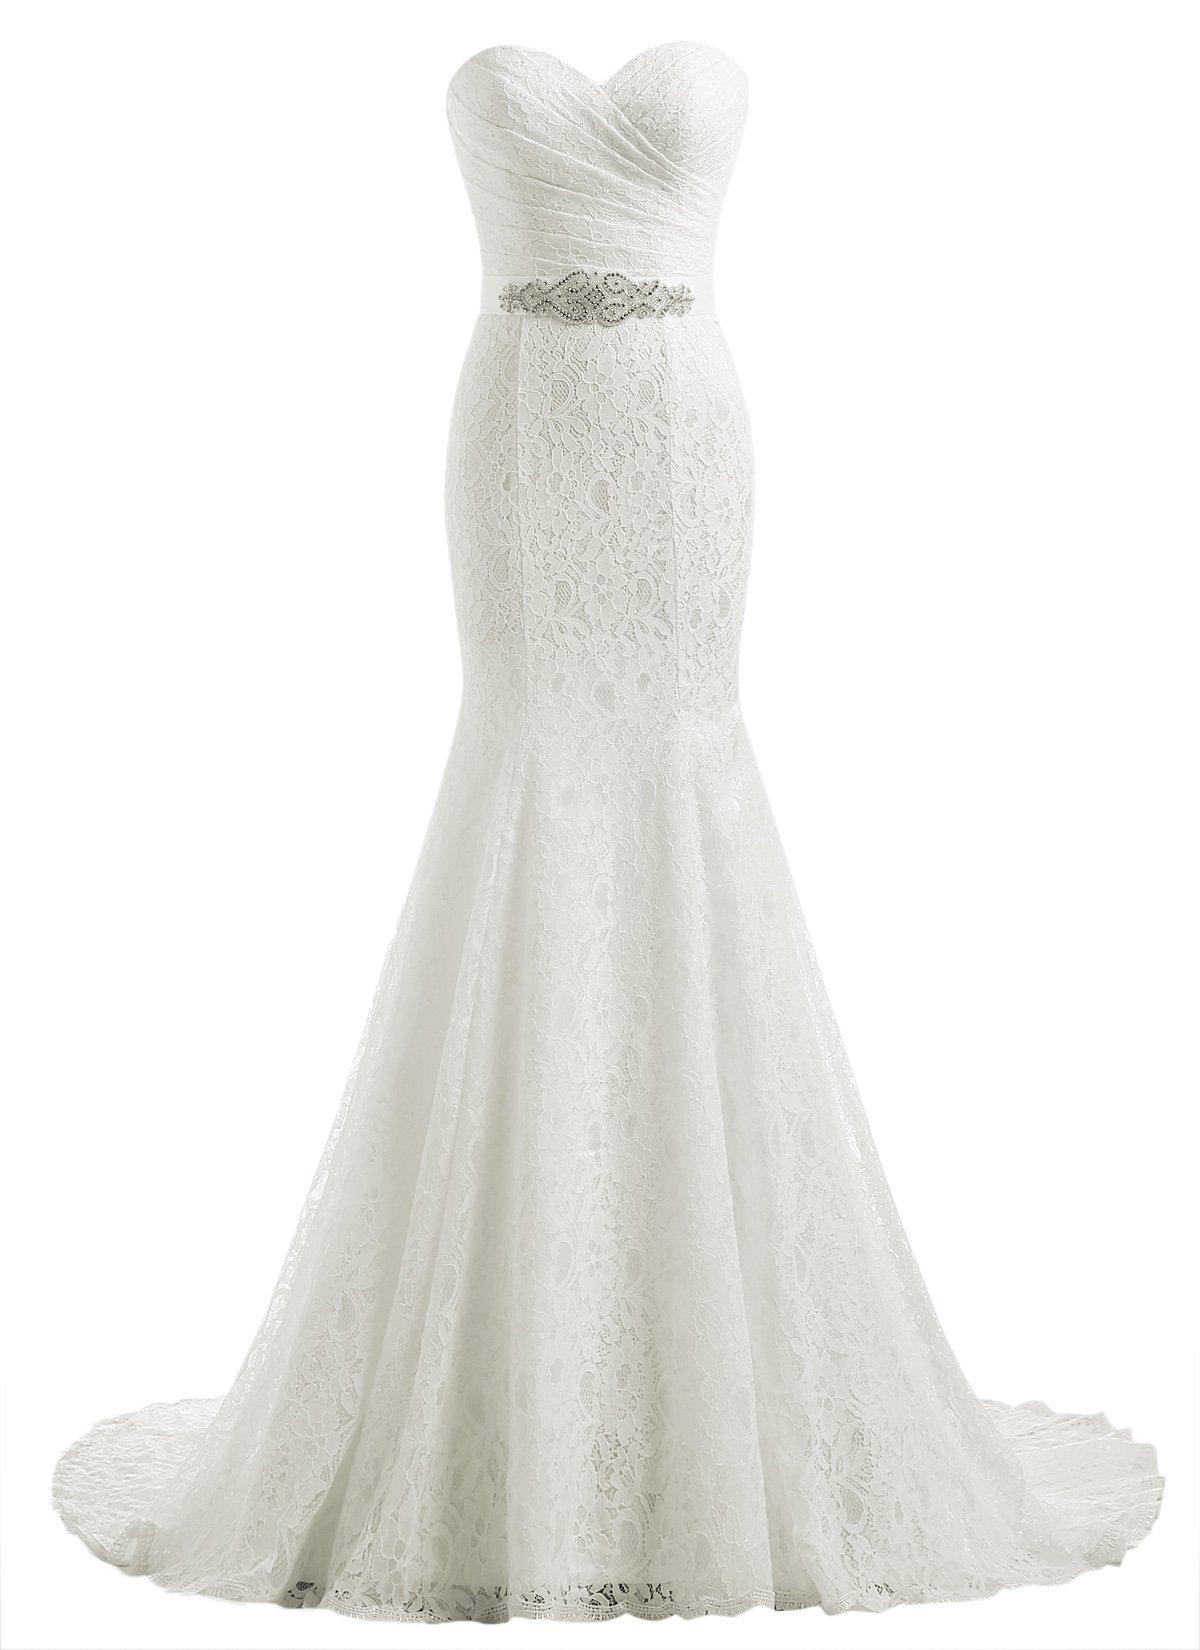 Beautyprom Women's Lace Mermaid Bridal Wedding Dresses Ivory US16